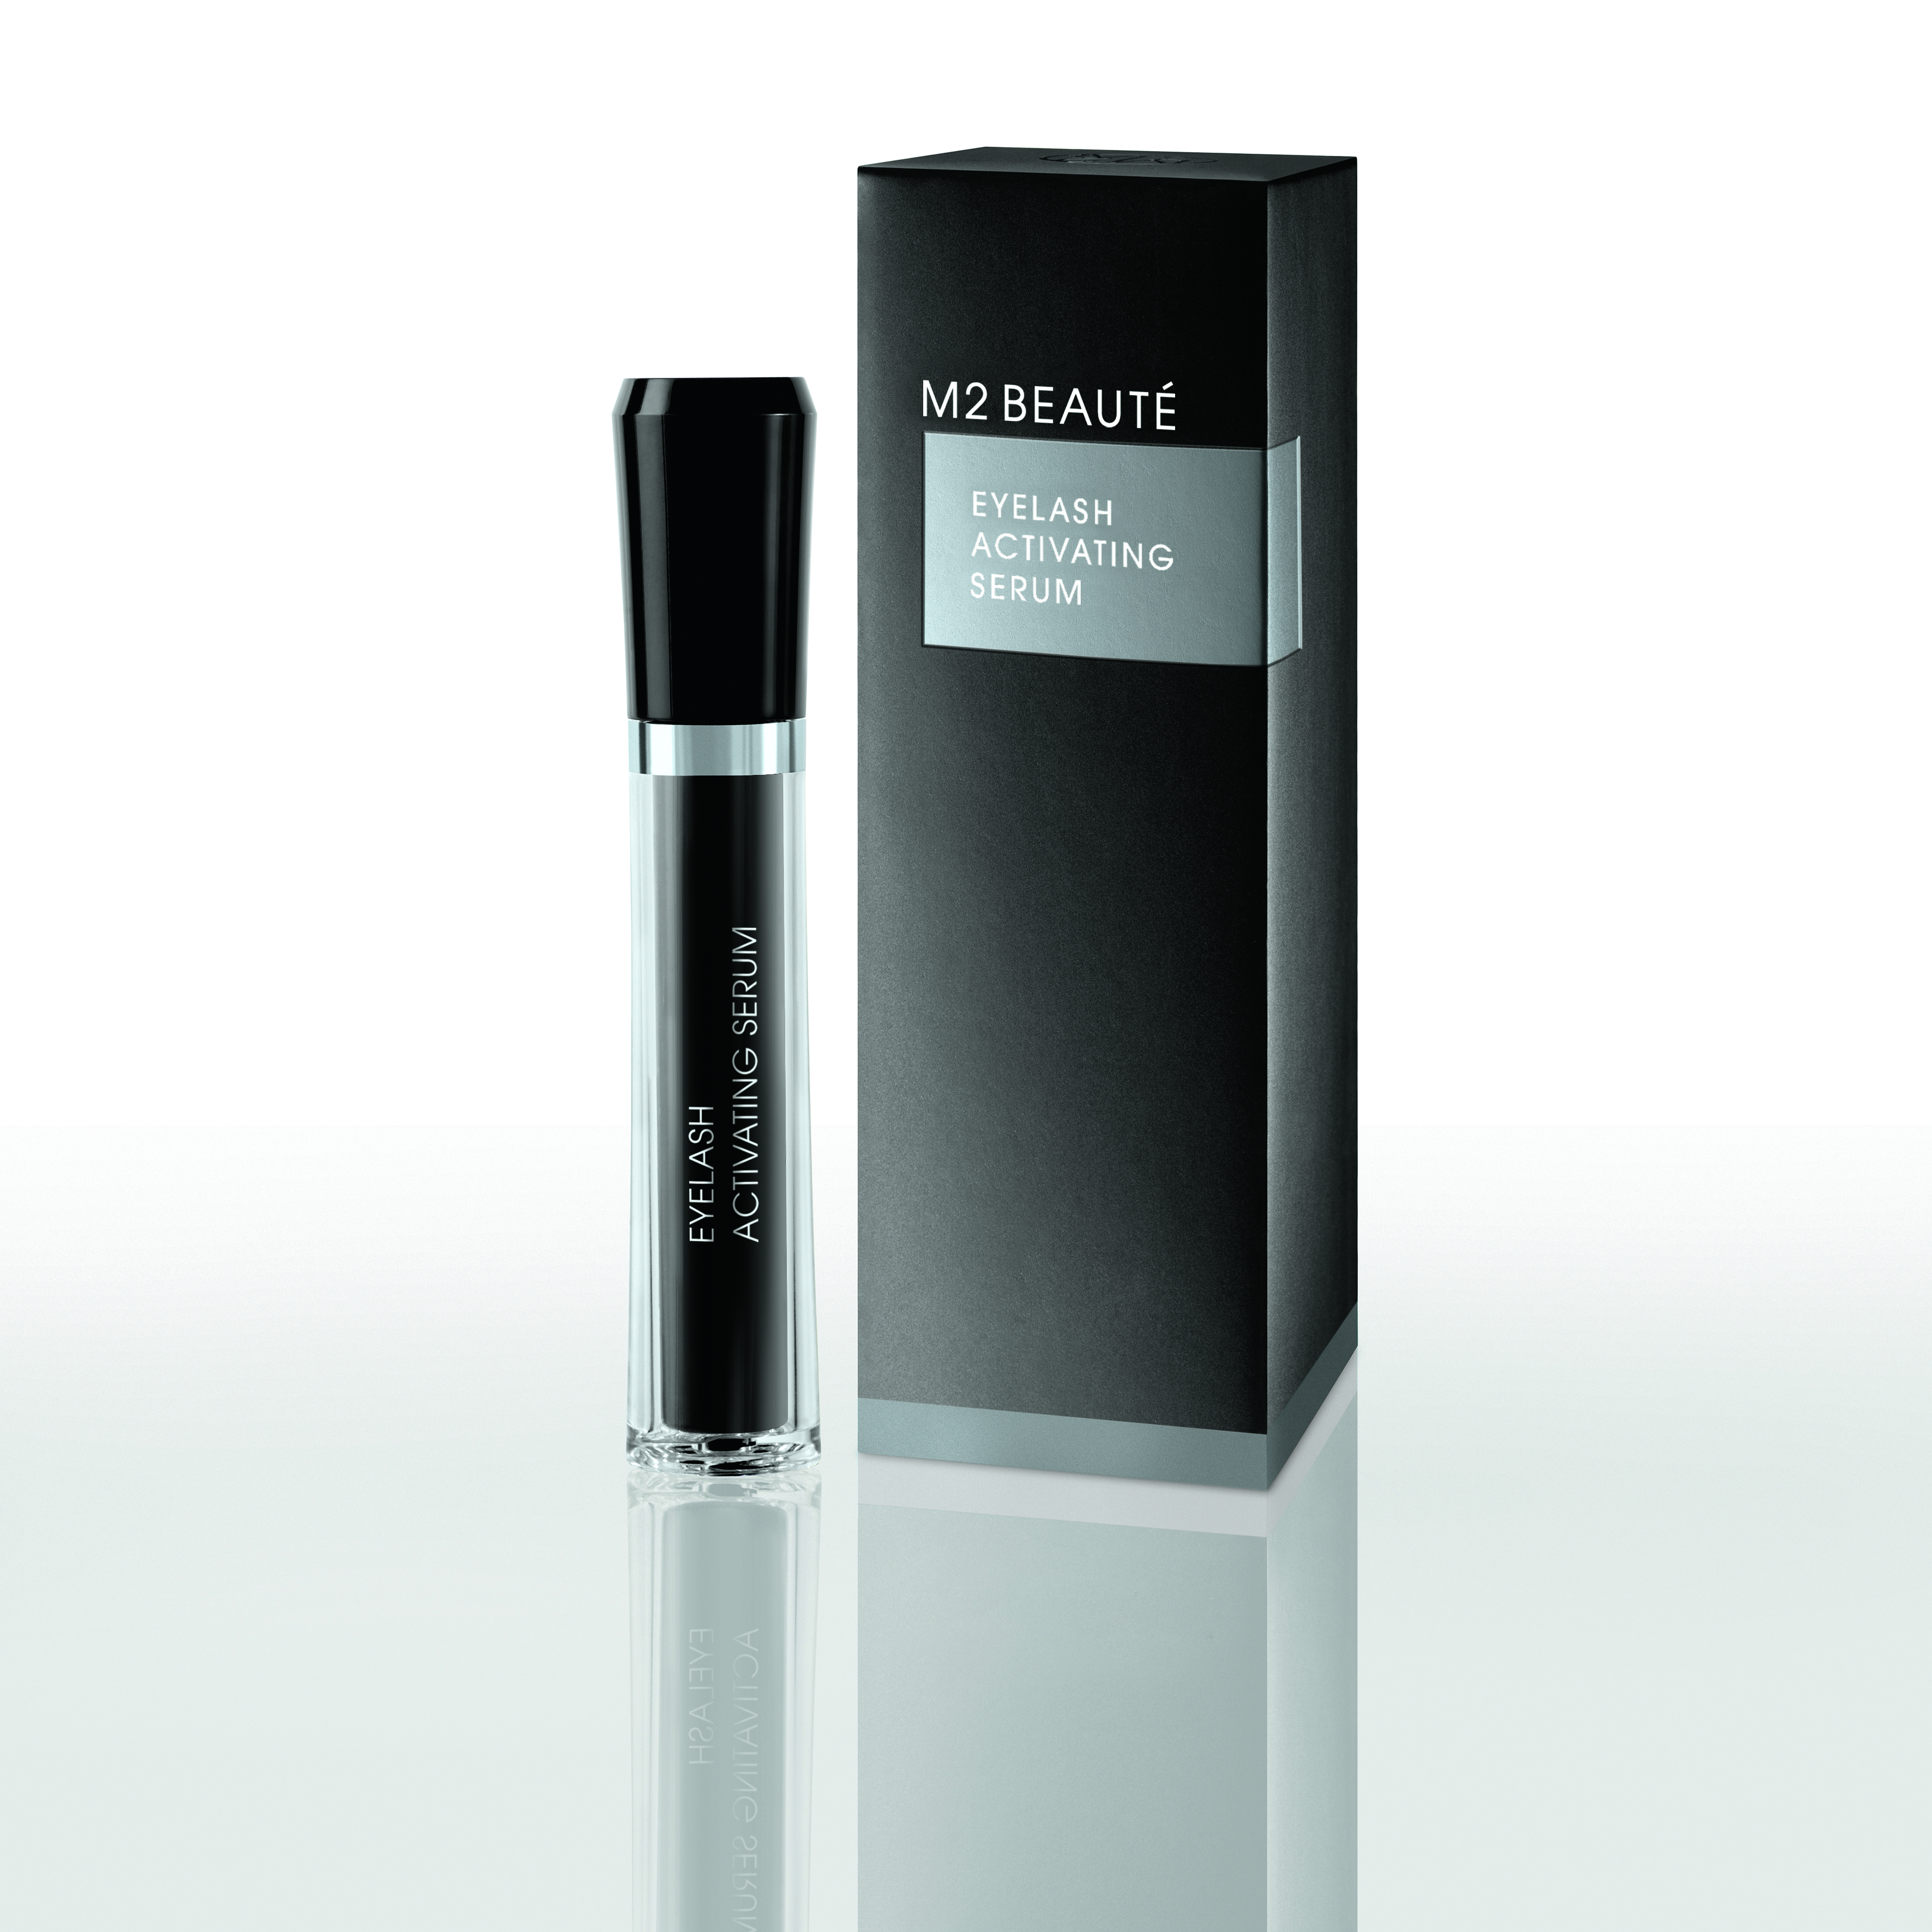 M2 Beauté Eyelash Activating Serum, 5 ml